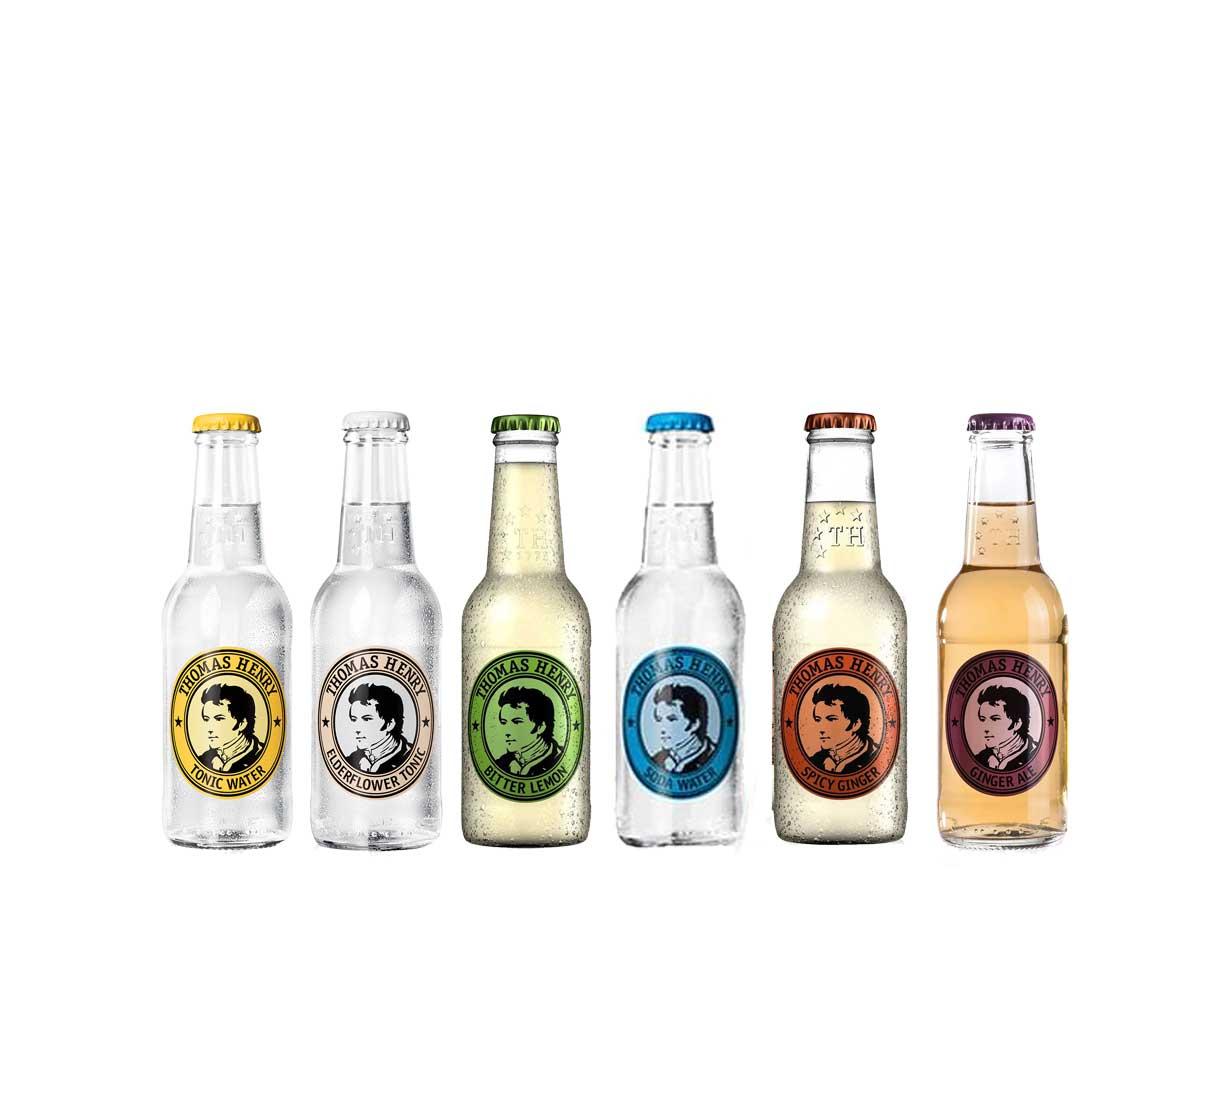 Thomas Henry Probierset - 6 Sorten - Ginger Ale, Bitter Lemon, Spicy Ginger, Tonic Water, Eldeflower Tonic, Soda Water - Inkl. Pfand MEHRWEG